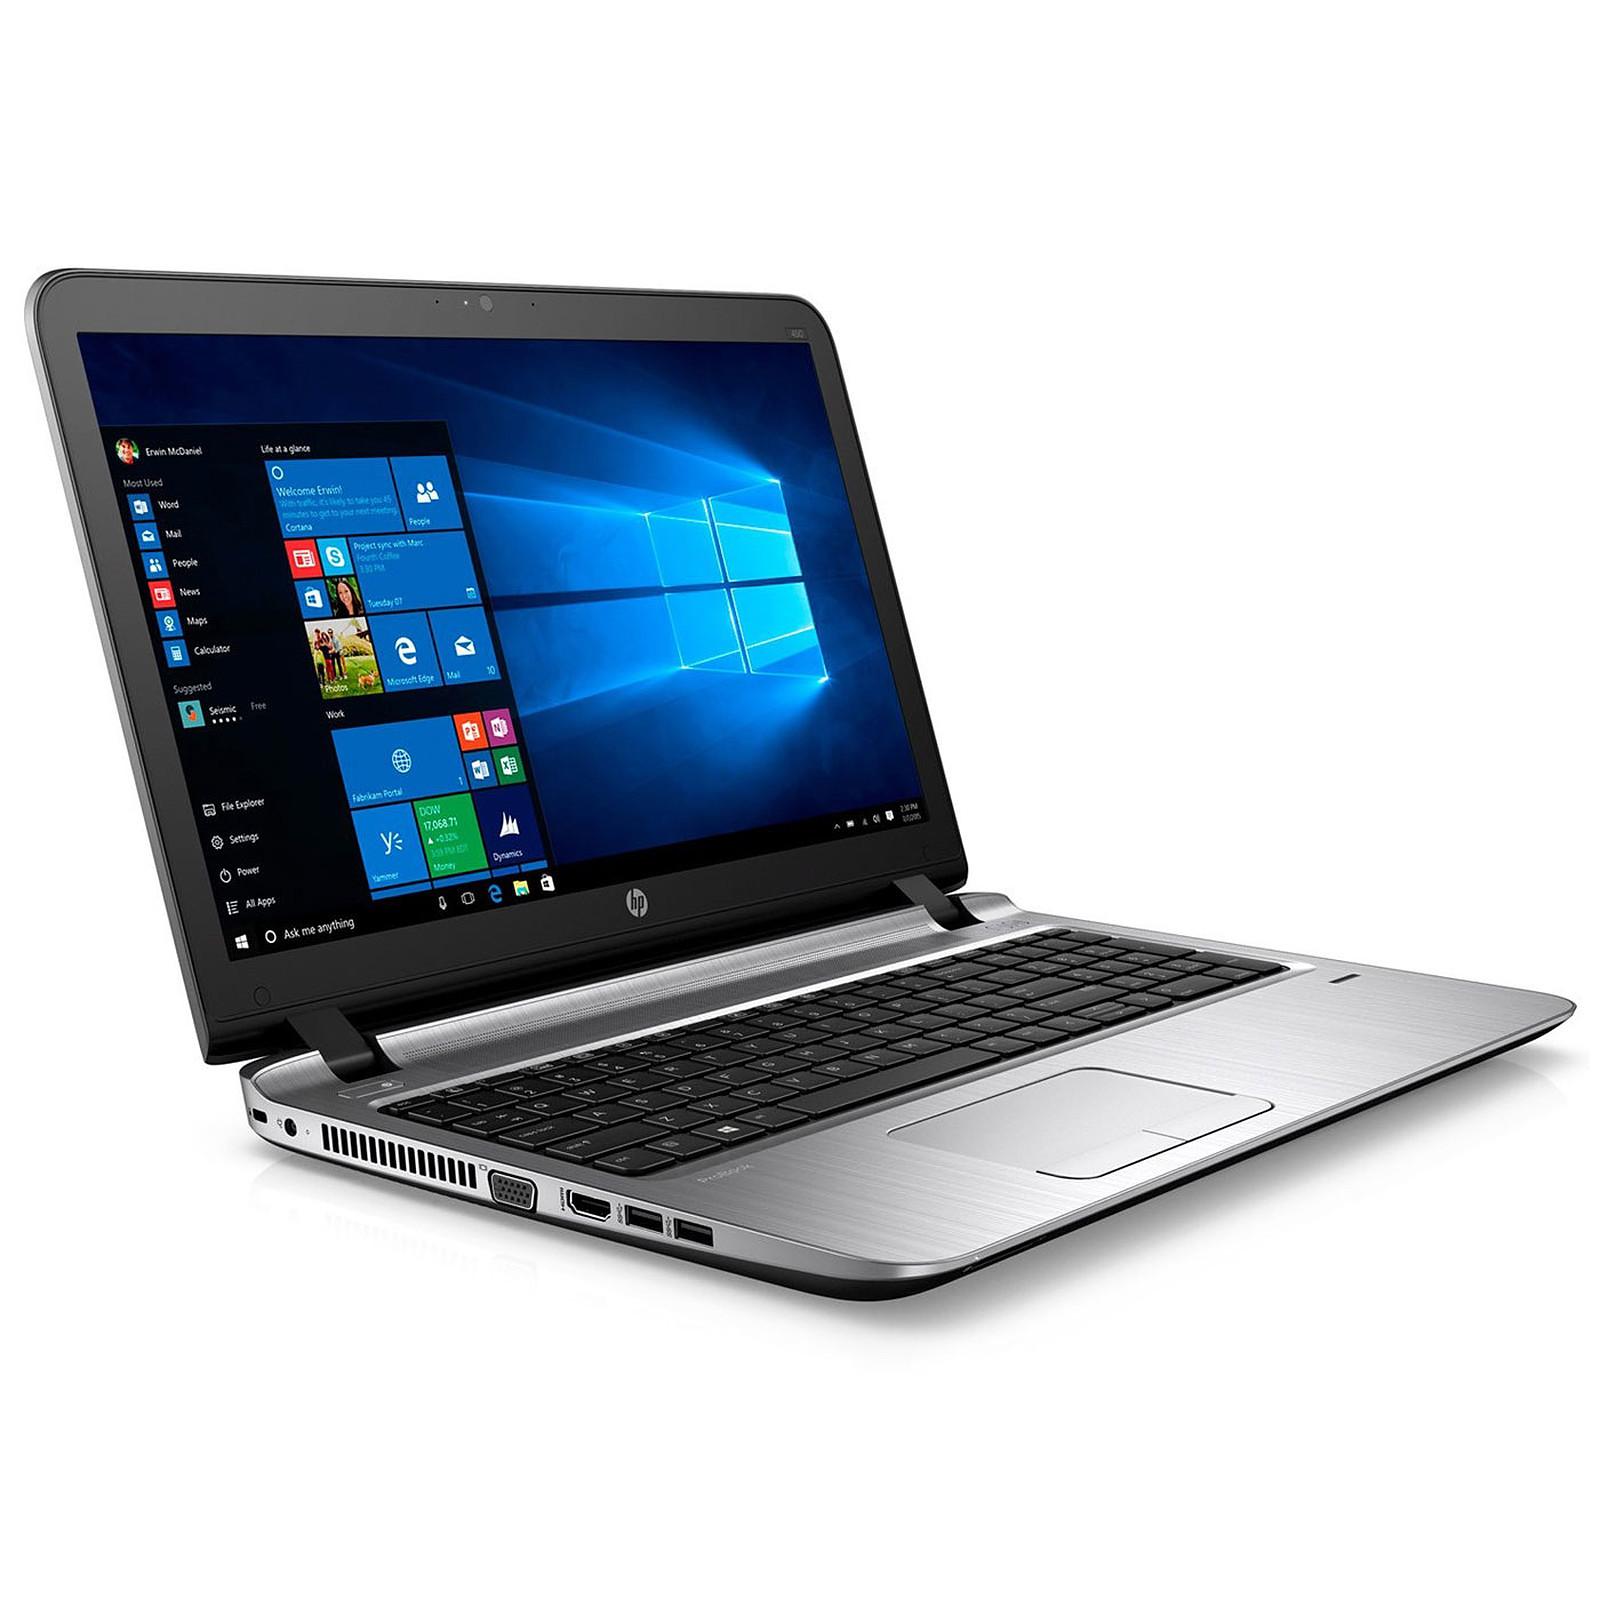 HP ProBook 450 G3 (P4P38ET)